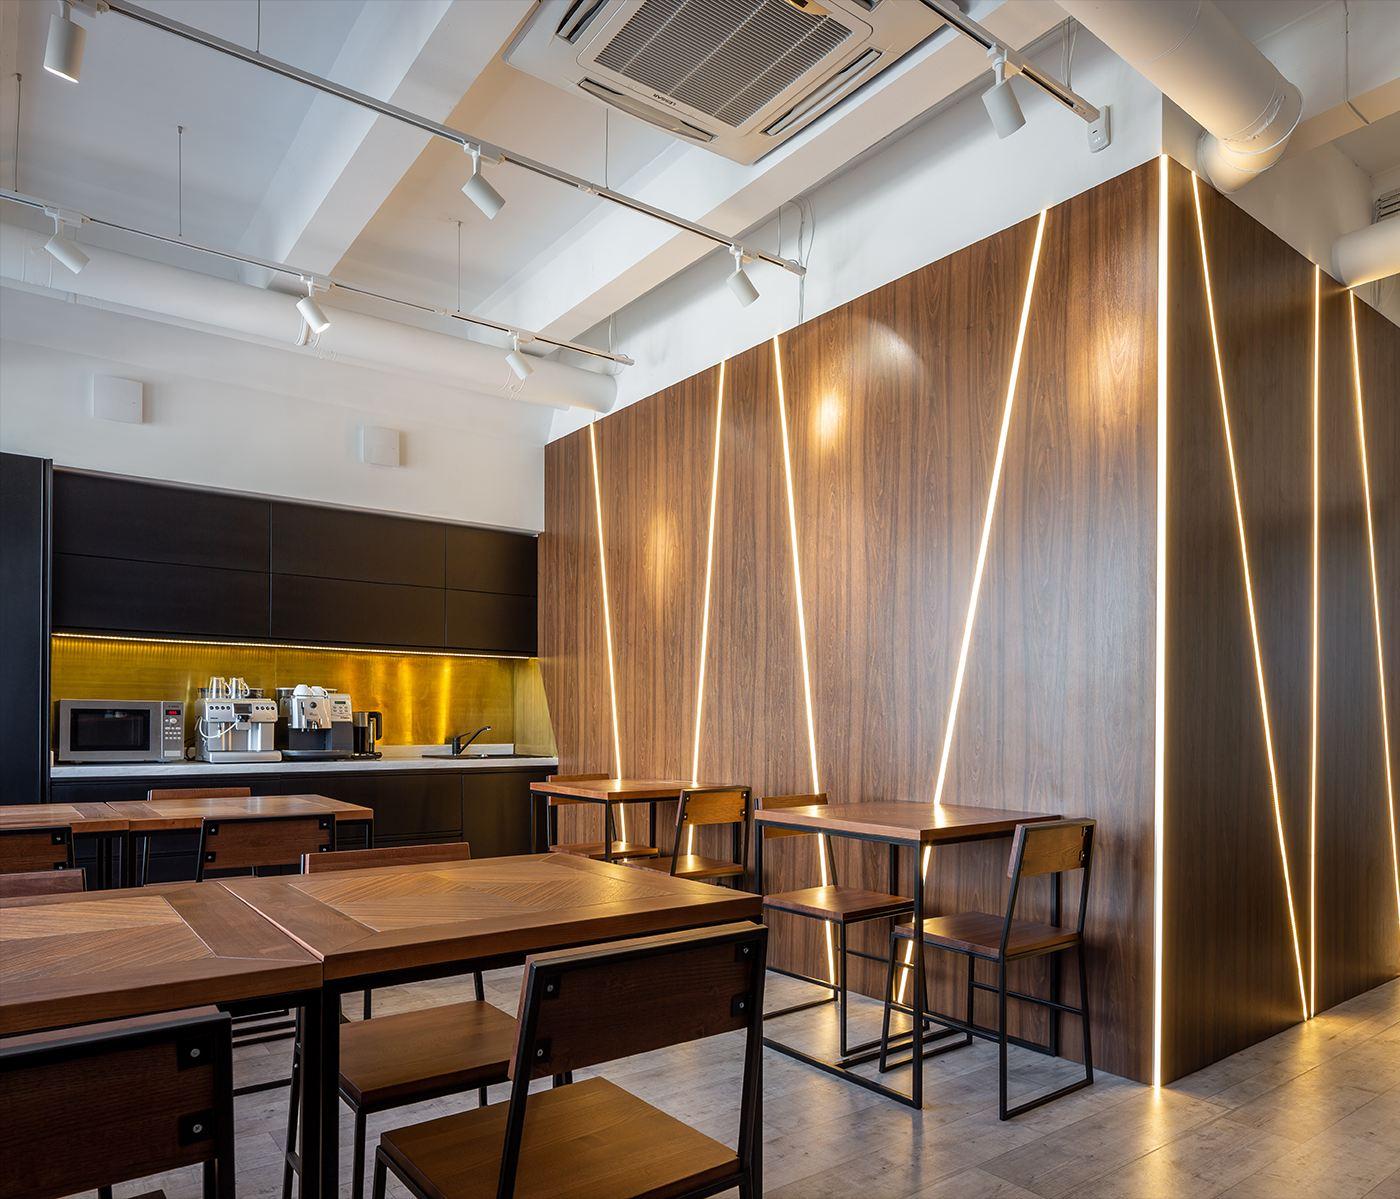 кухня с декоративными панелями и лед-подсветкой